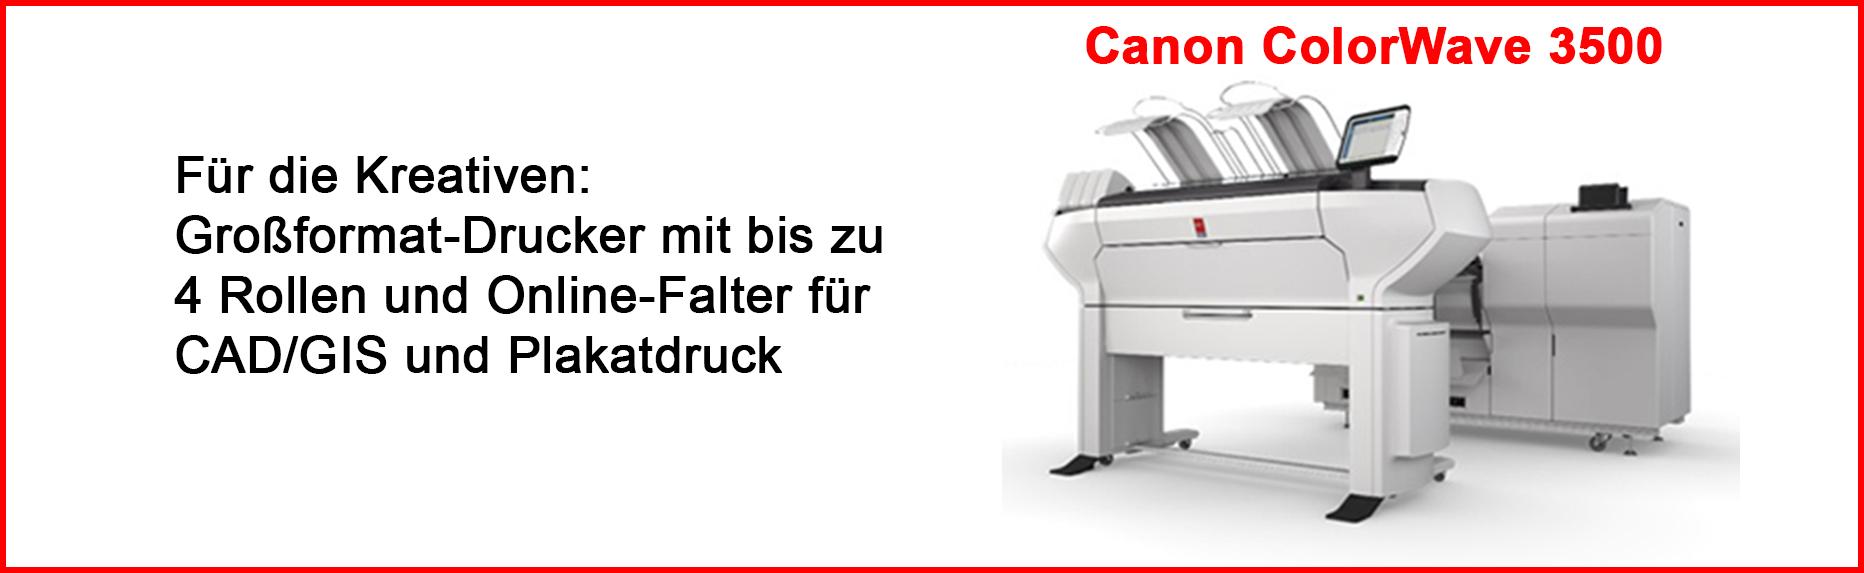 Canon Colorwave 3500